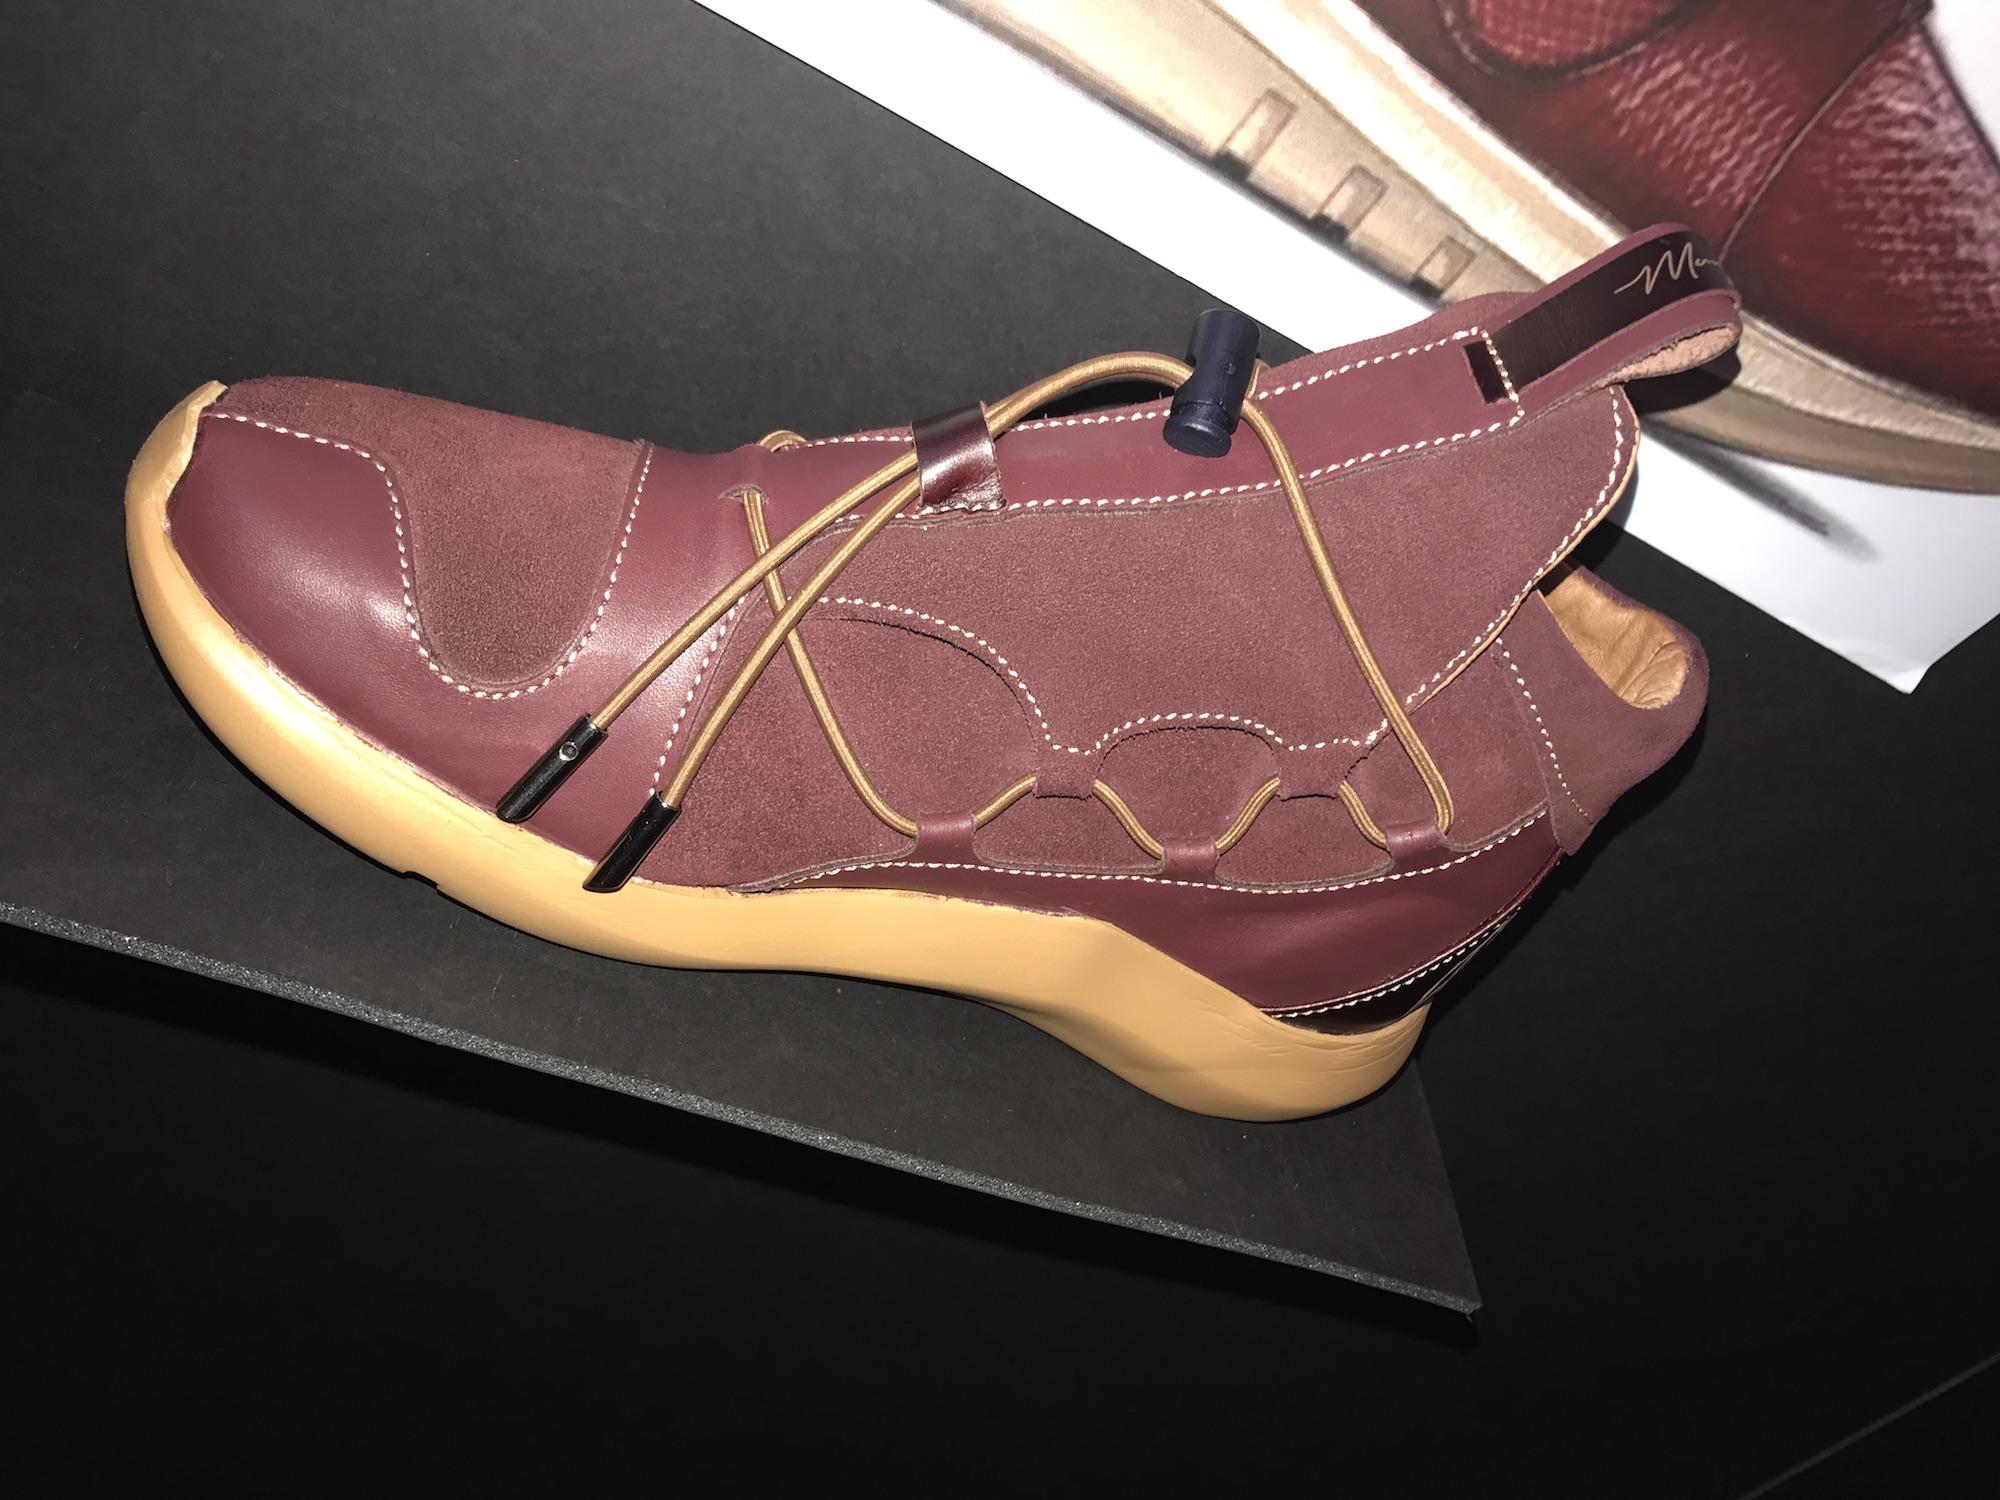 PENSOLE World Sneaker Championship maxwell lund 19